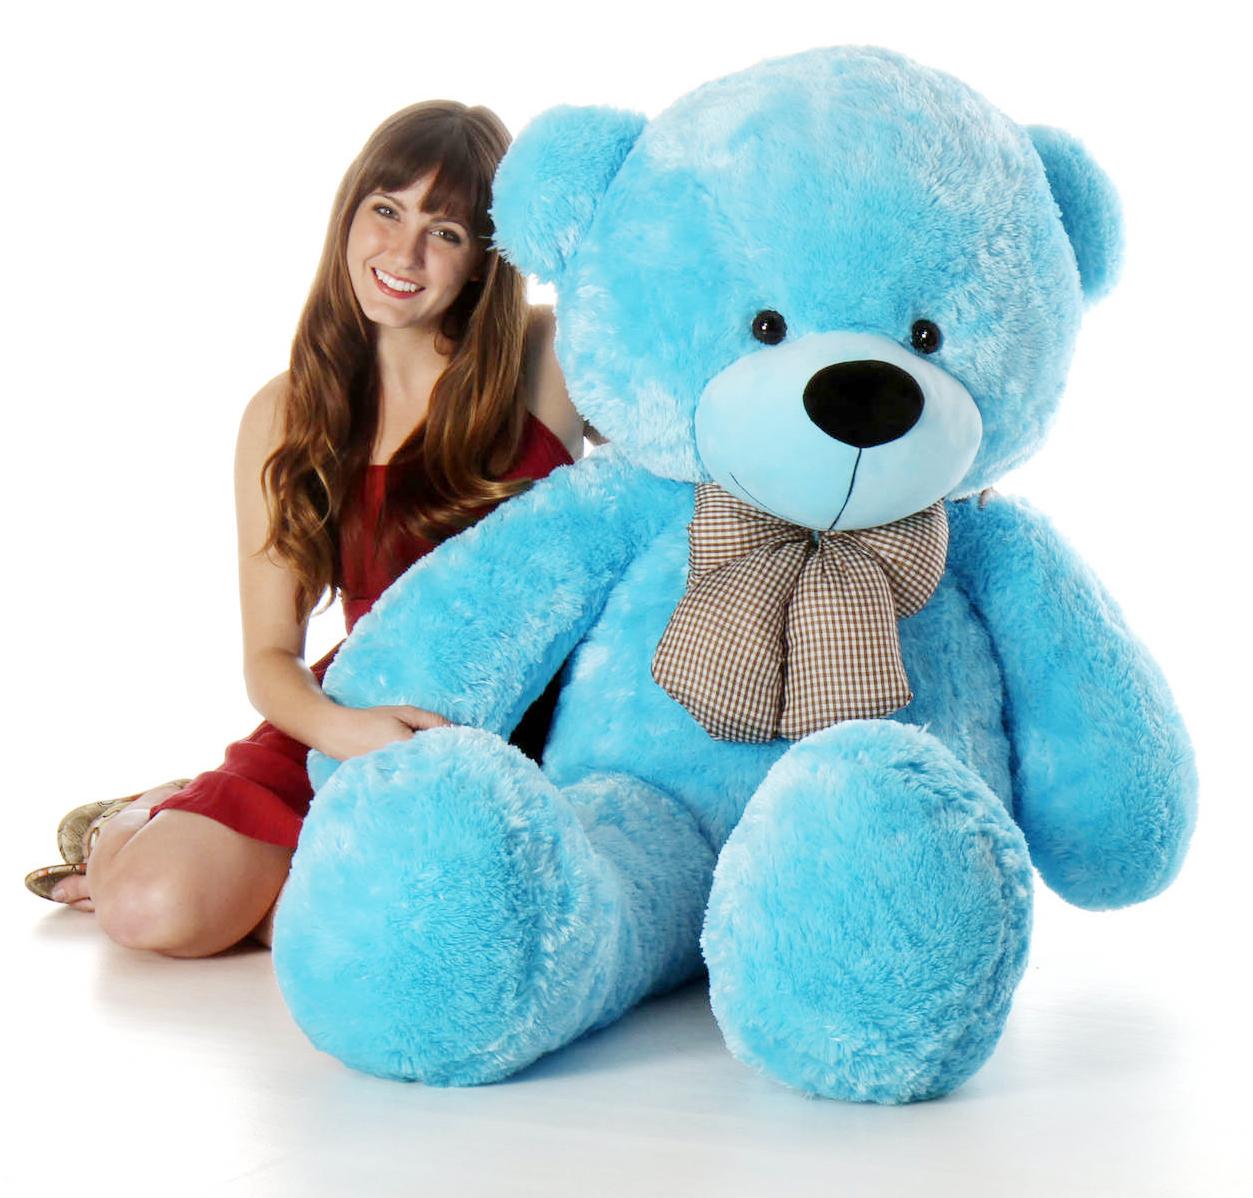 6 Feet Giant Teddy Bear In Philippines Online Teddy Bear To